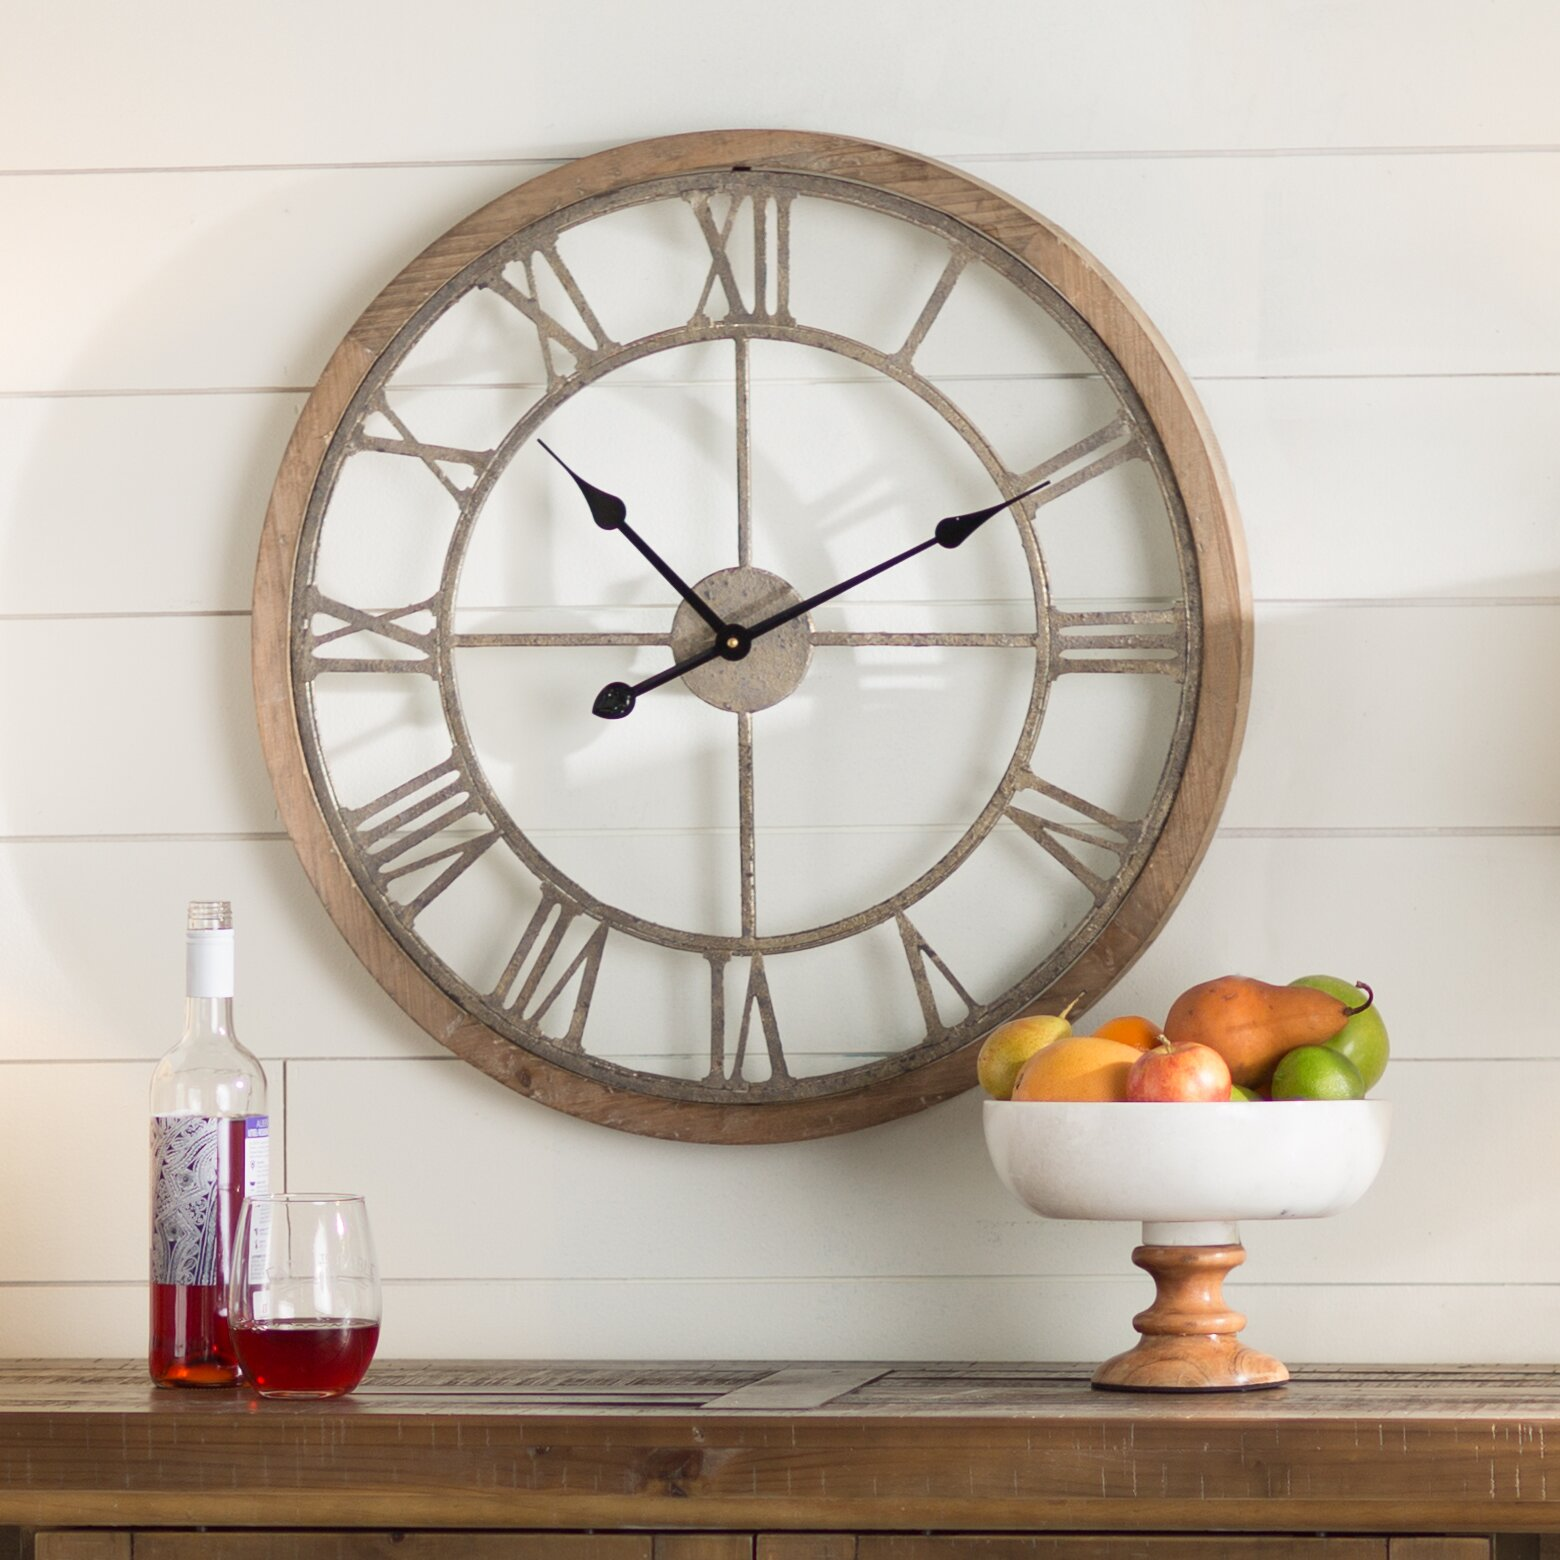 Laurel foundry modern farmhouse natural wood wall clock - Laurel foundry modern farmhouse bedroom ...